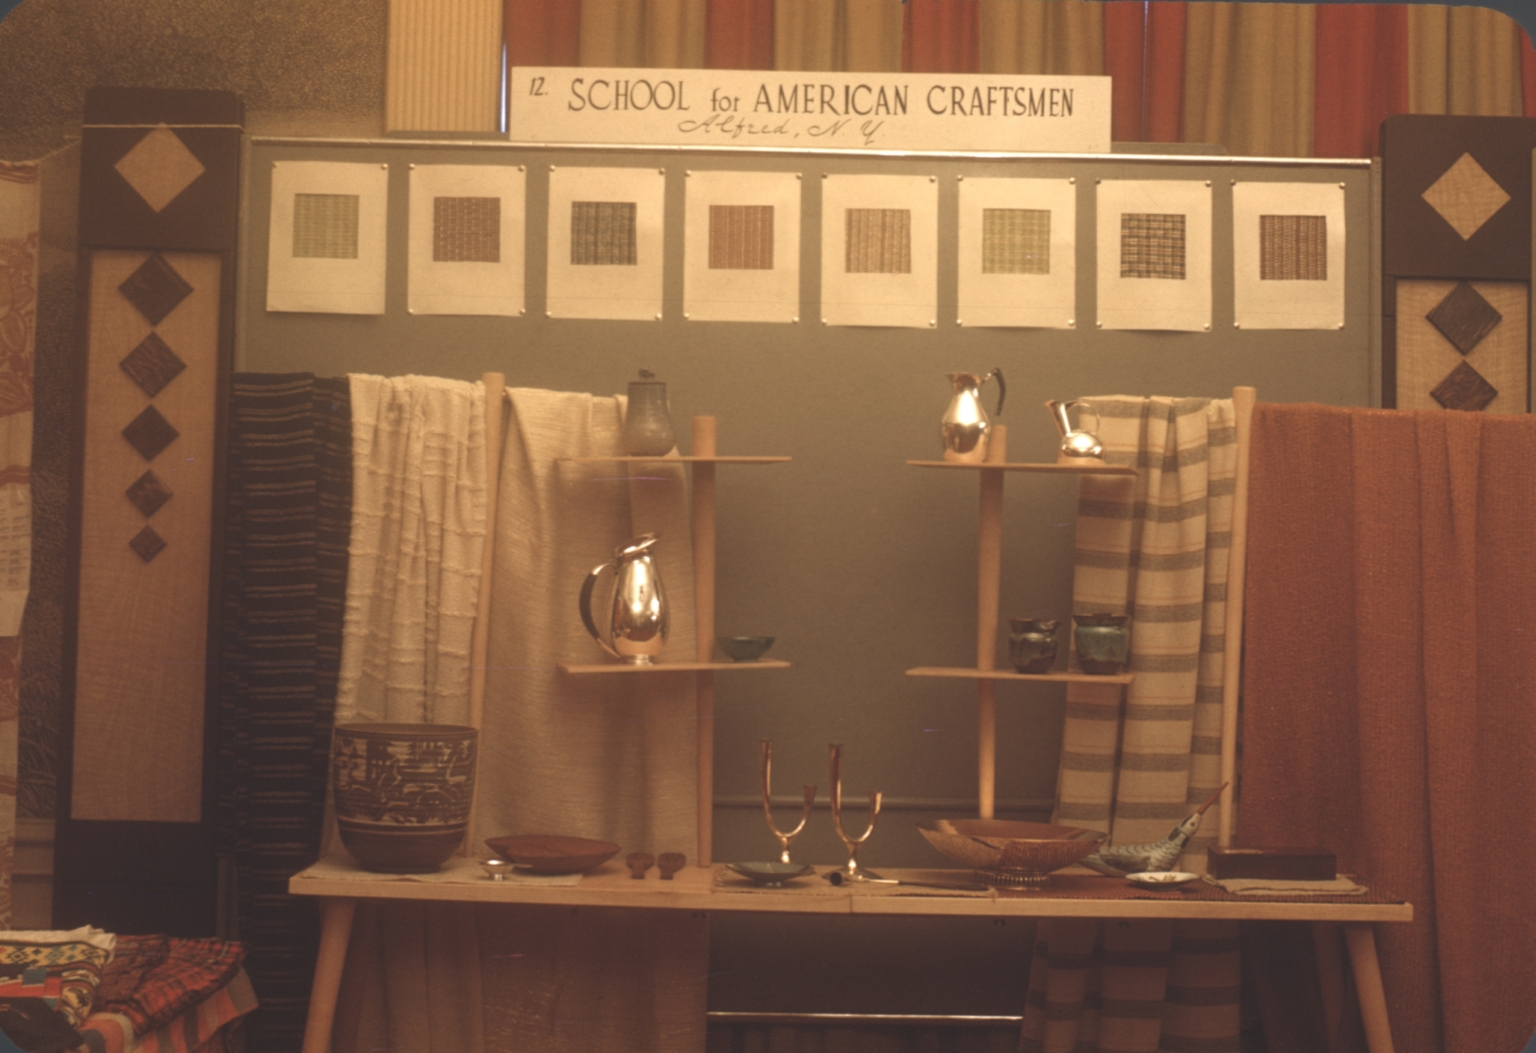 Exhibition of fabrics, ceramics and metal works